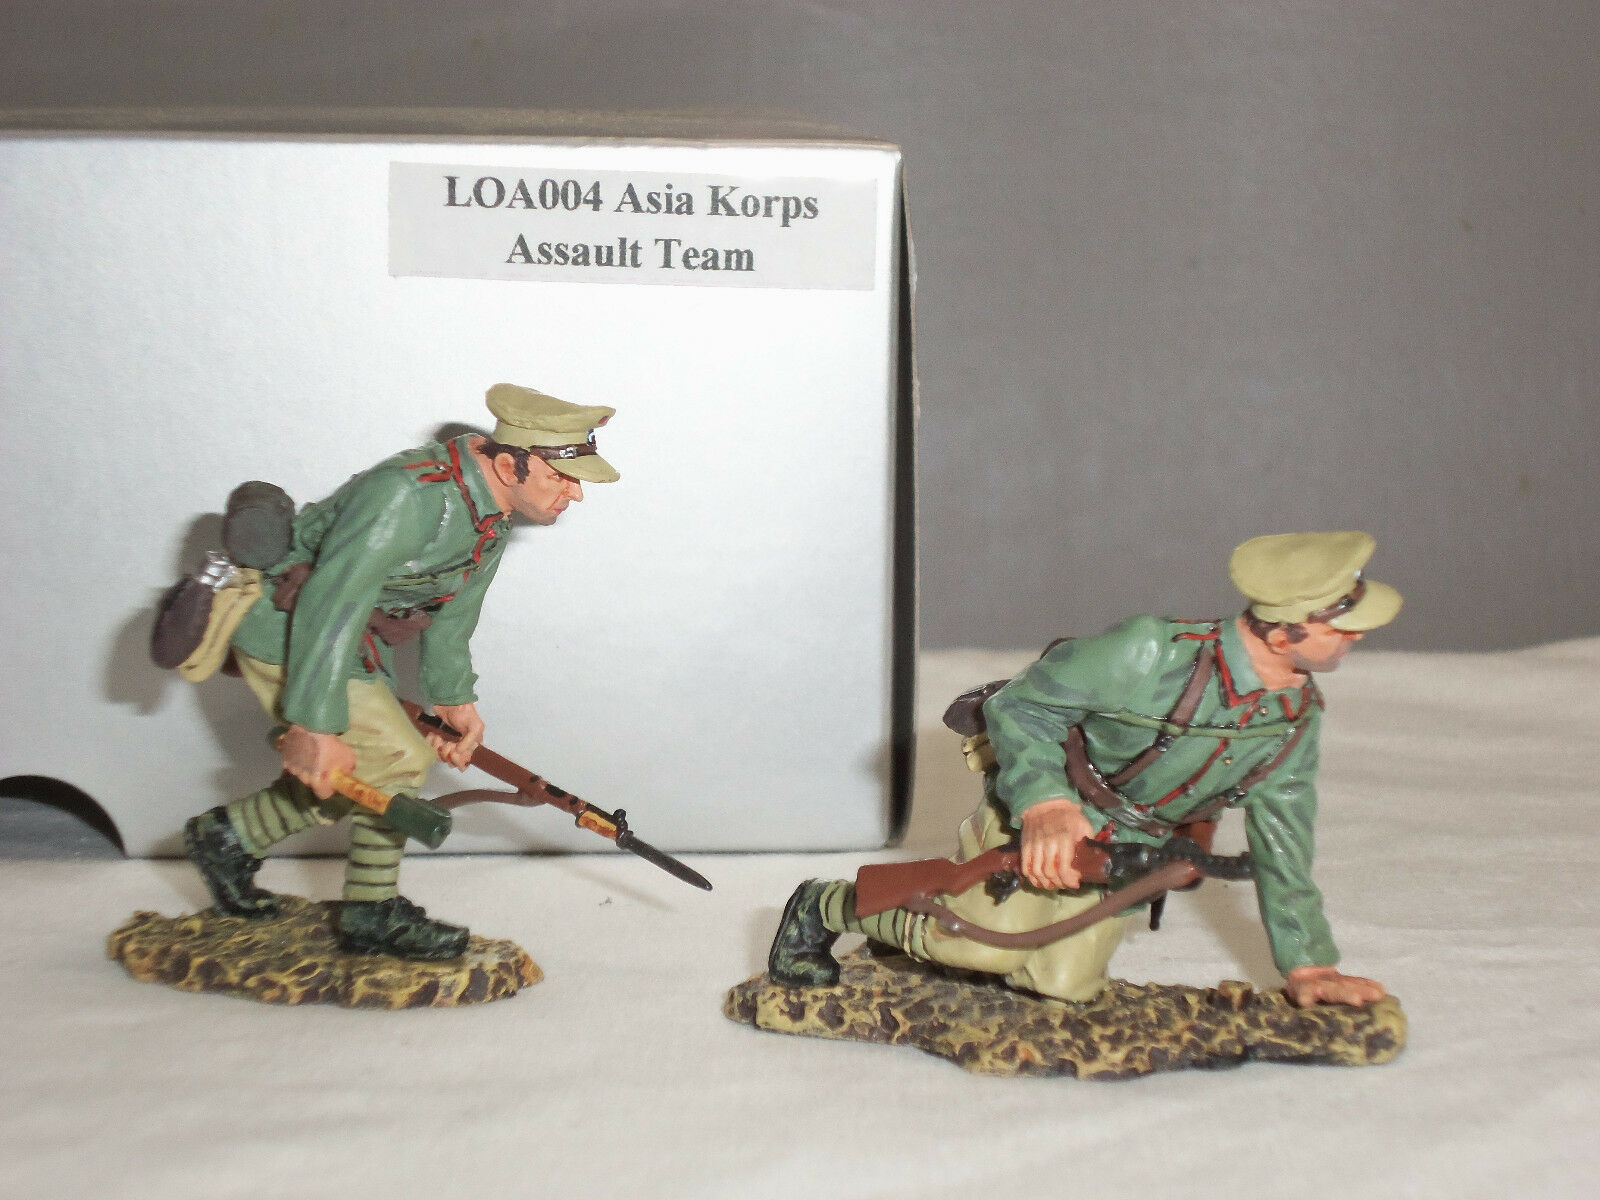 THOMAS GUNN LOA004 WW1 GERMAN STORMTROOPER ASIA KORPS ASSAULT TEAM FIGURE SET